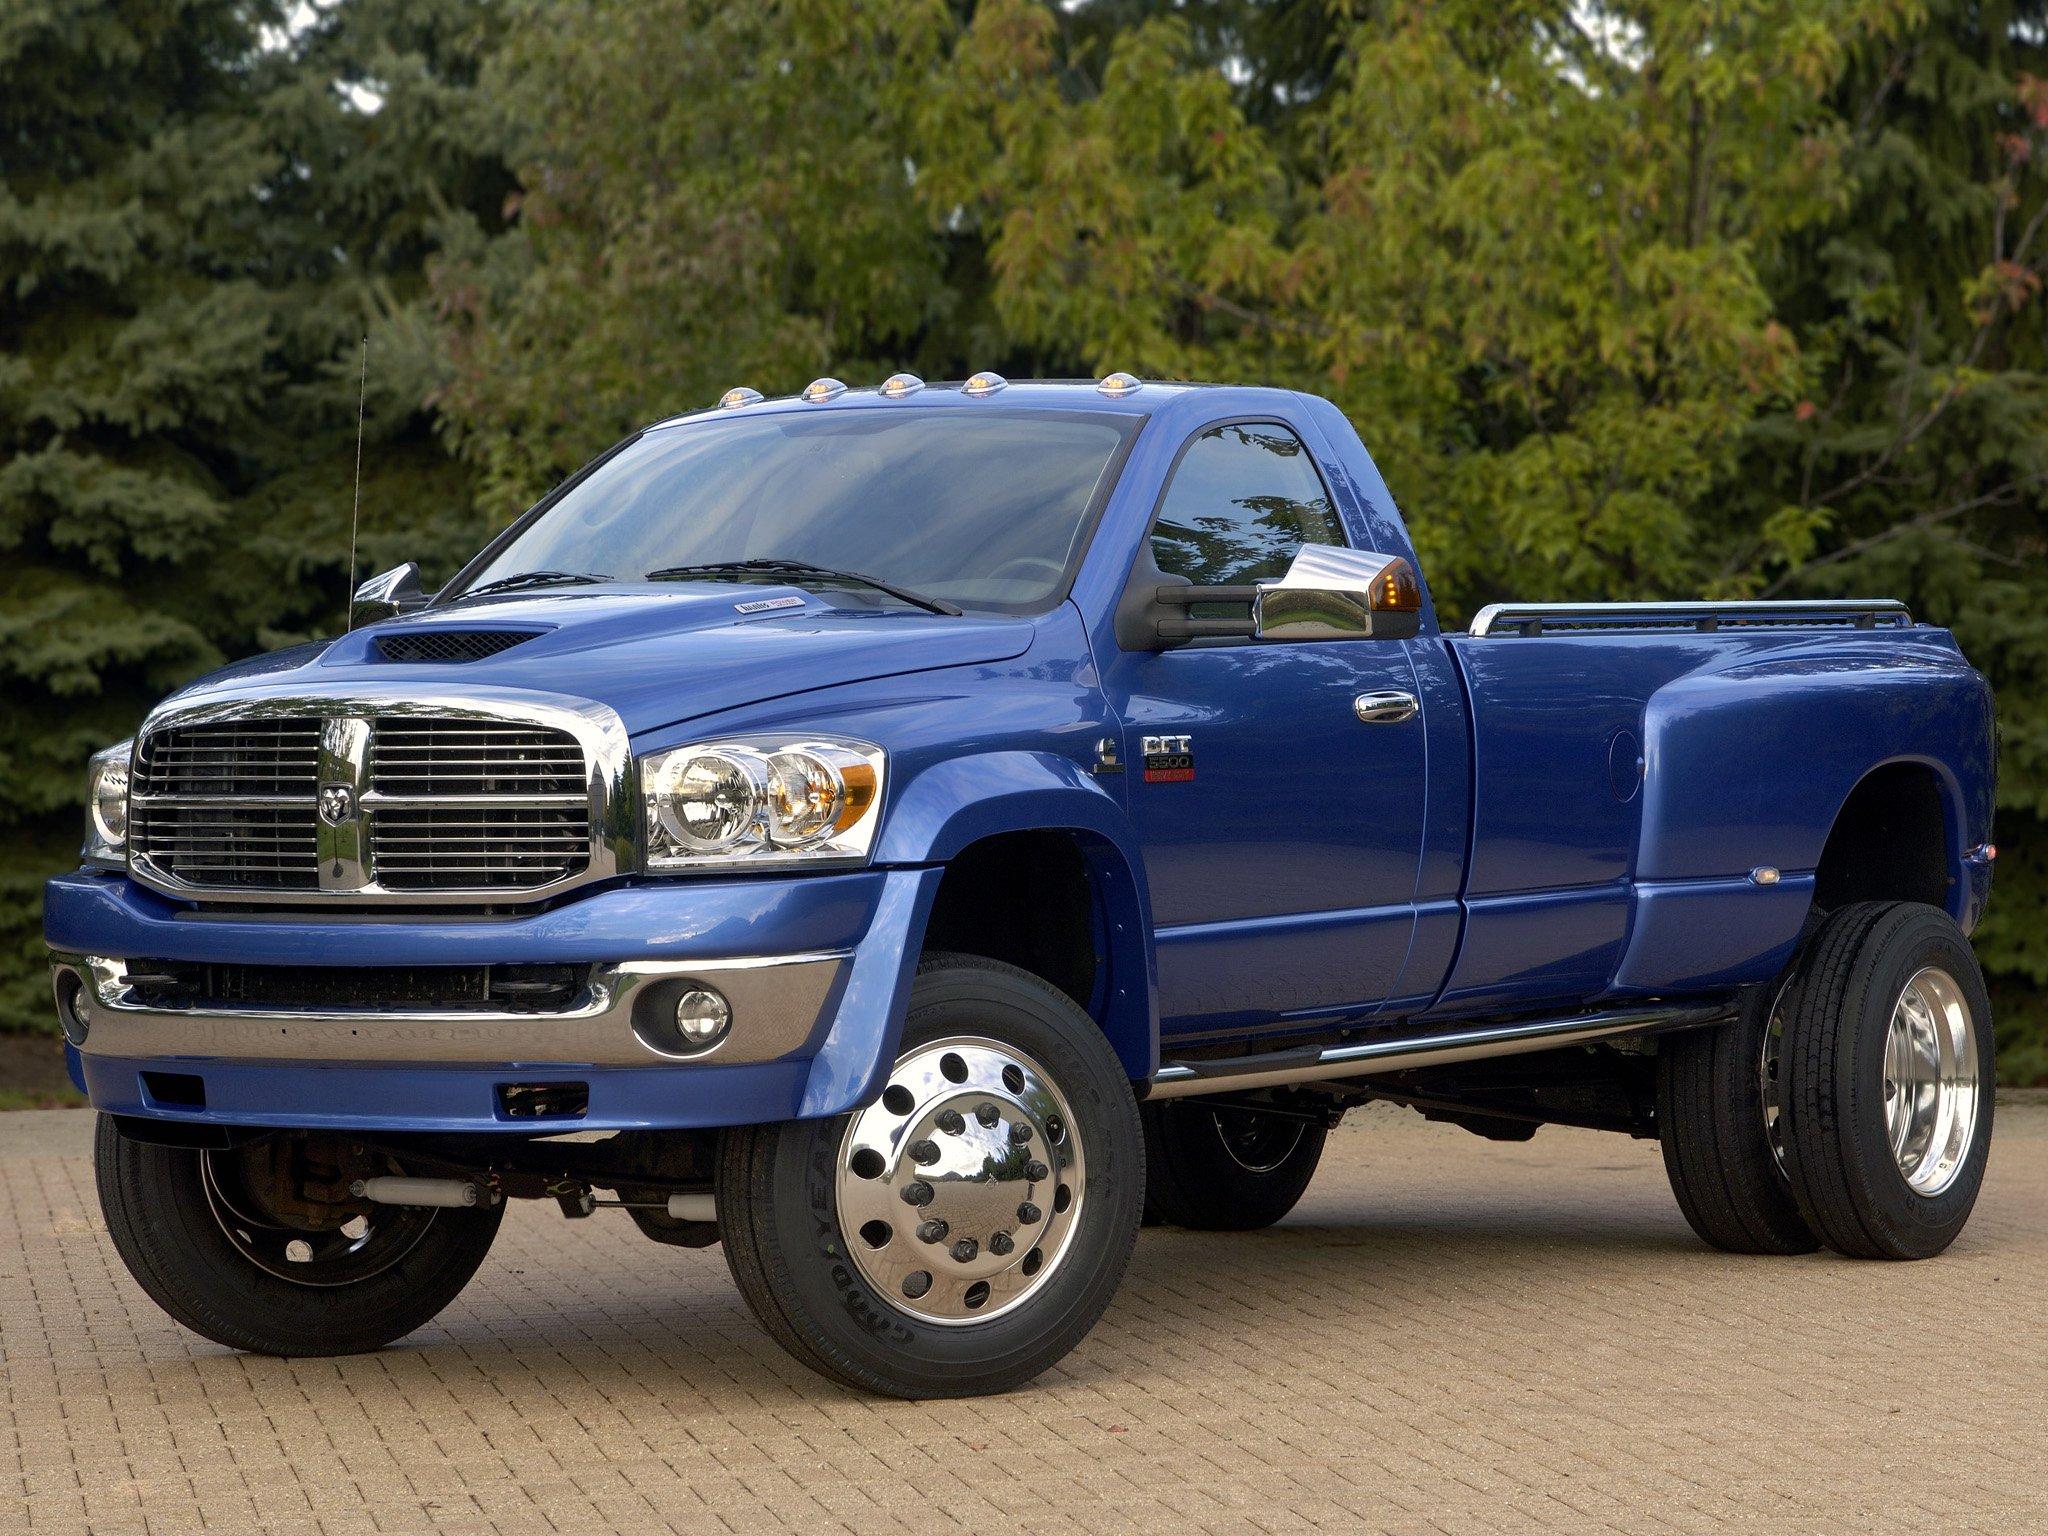 2007 dodge ram bft pickup diesel 4x4 wallpaper 2048x1536 - Diesel truck wallpaper ...